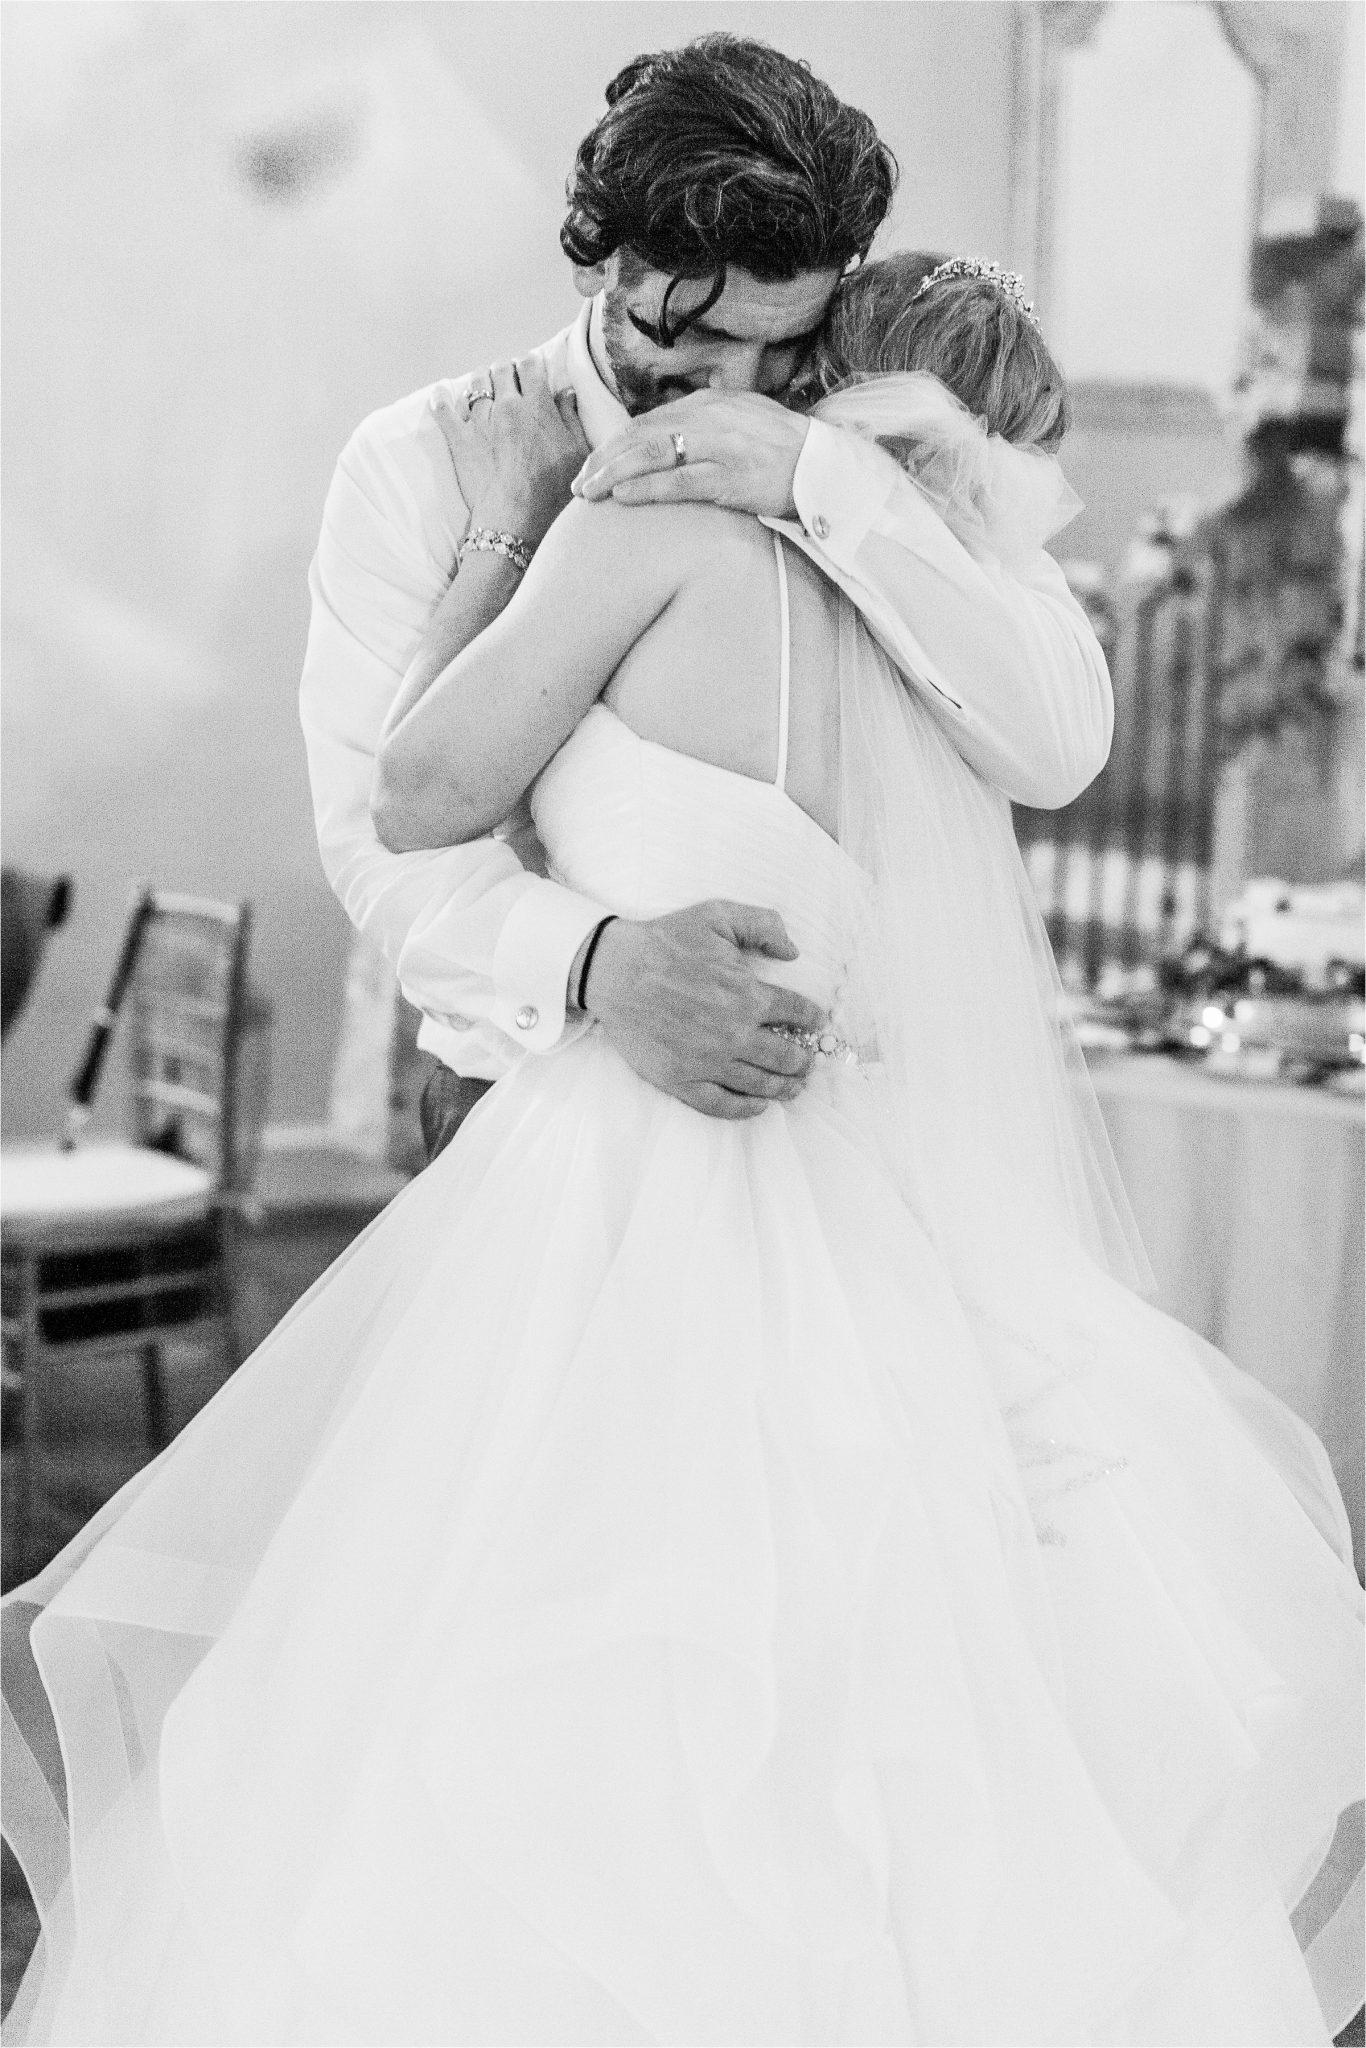 Romantic Destination Wedding Photographer-Bella Sera Gardens-Sarra + Matt-Bridal photography-Bride and groom-Purple themed wedding-Alabama wedding-Alabama photographer-Sentimental bride and groom-precious wedding moments